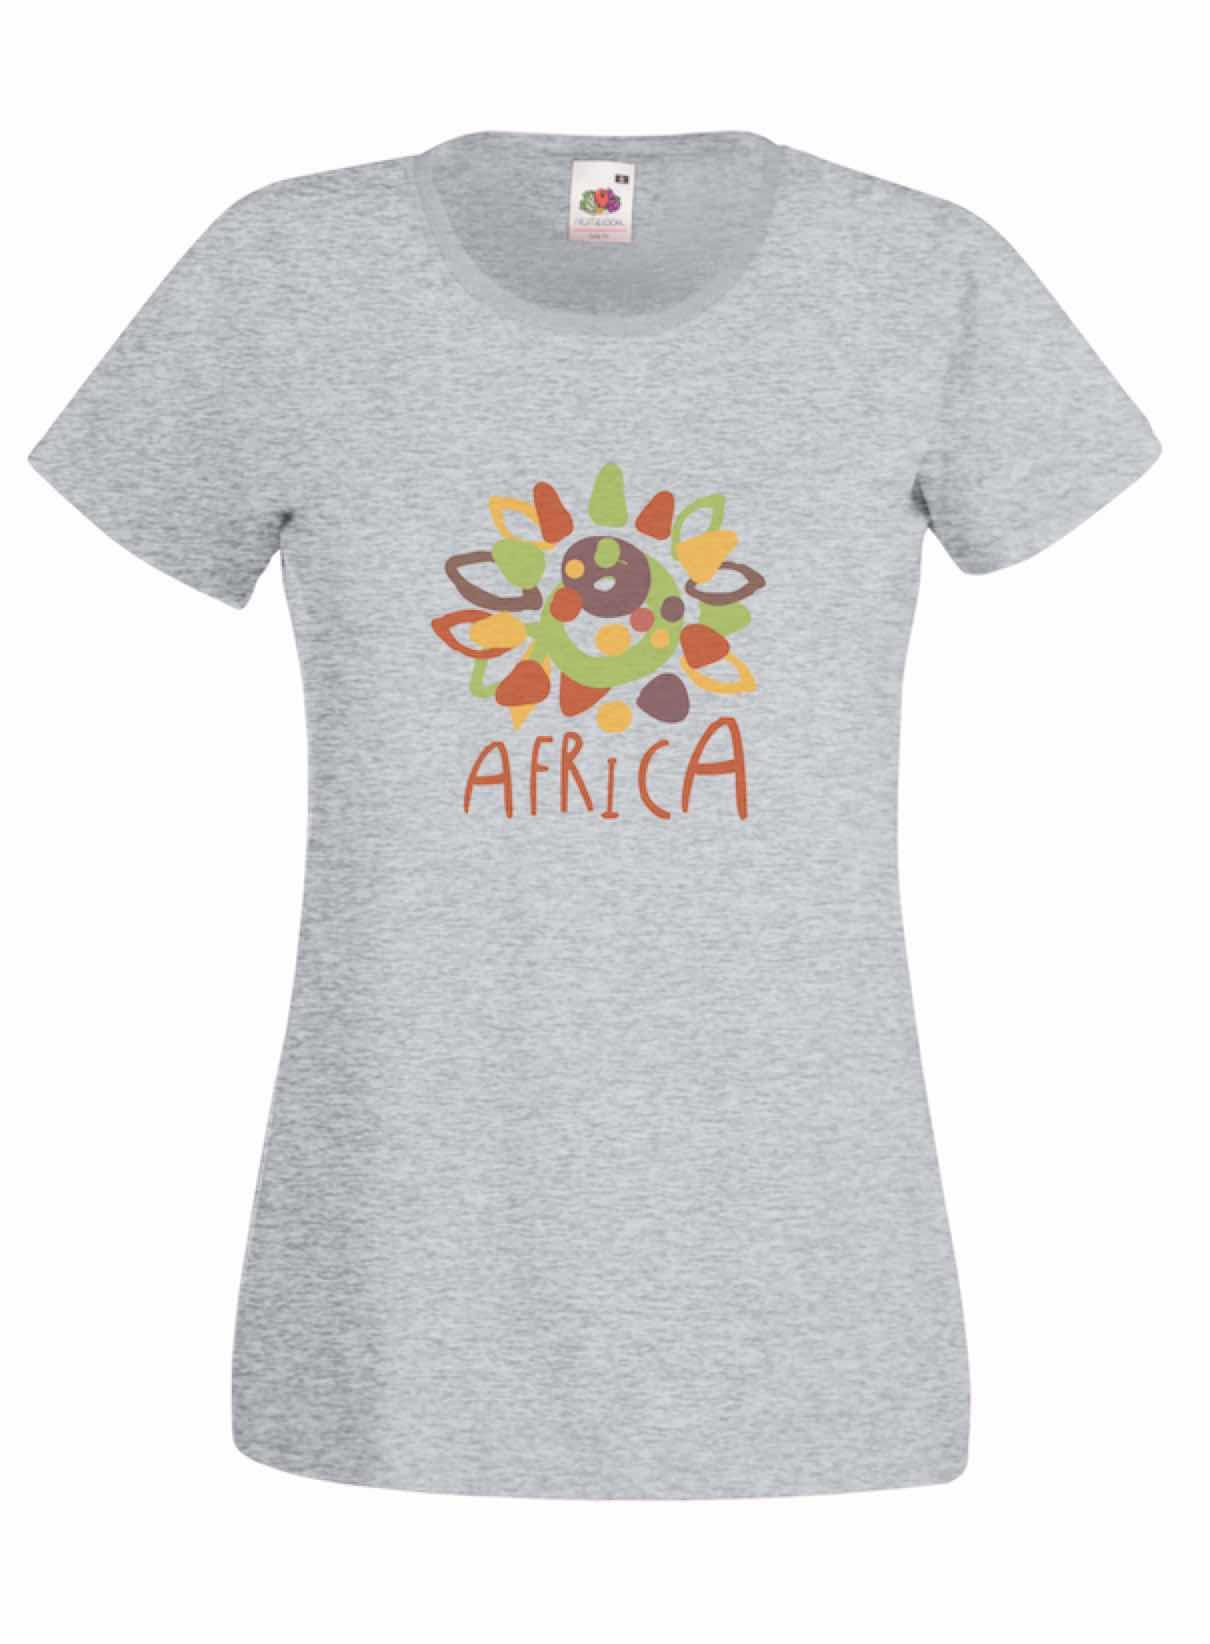 Flower design for t-shirt, hoodie & sweatshirt